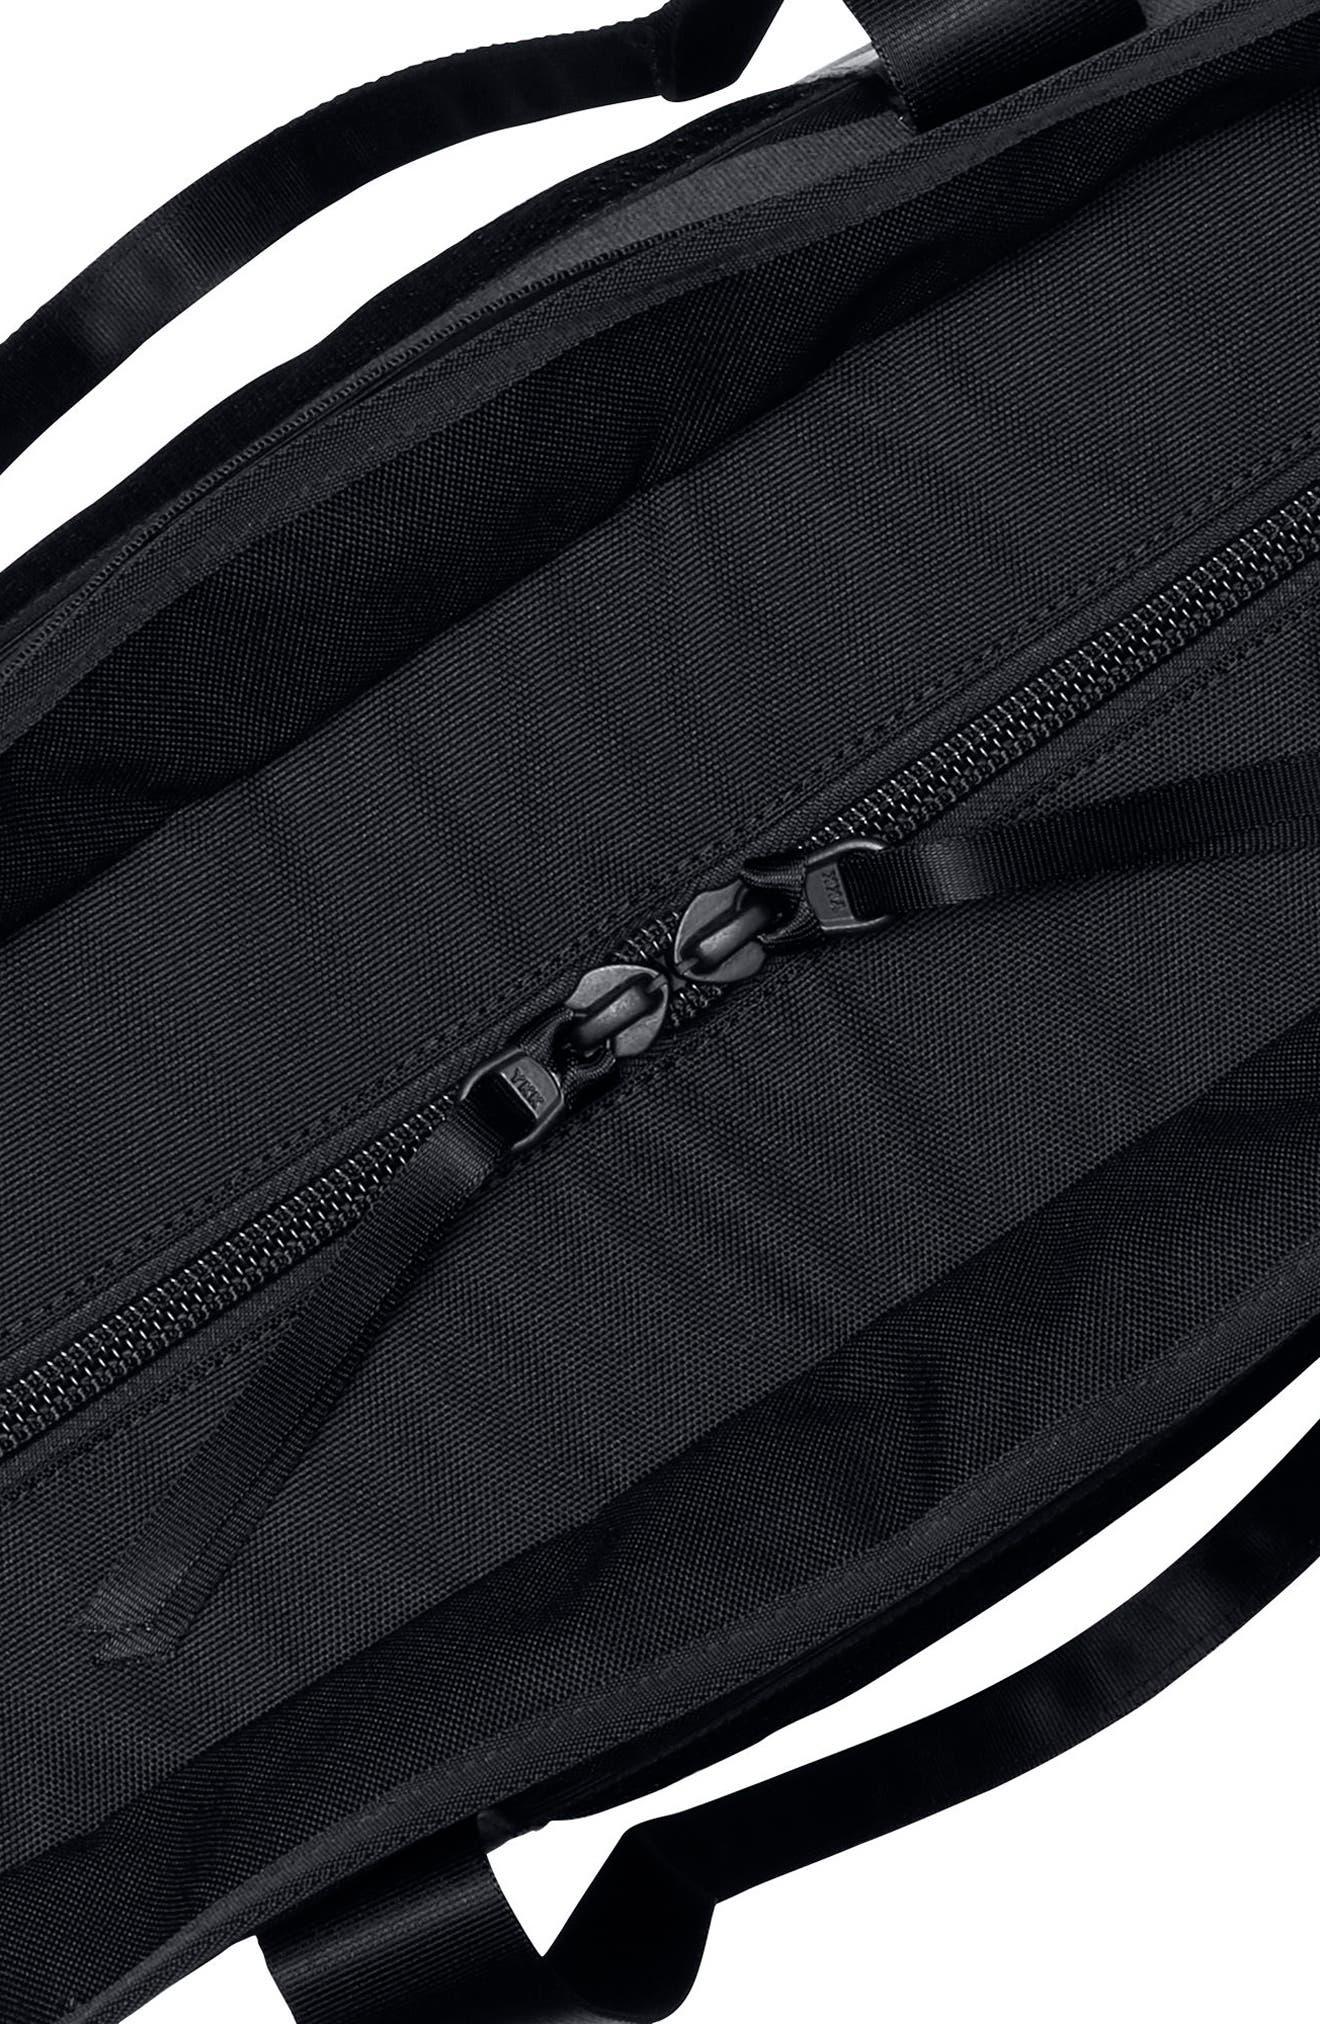 NikeLab Tote,                             Alternate thumbnail 6, color,                             BLACK/ ALE BROWN/ BLACK